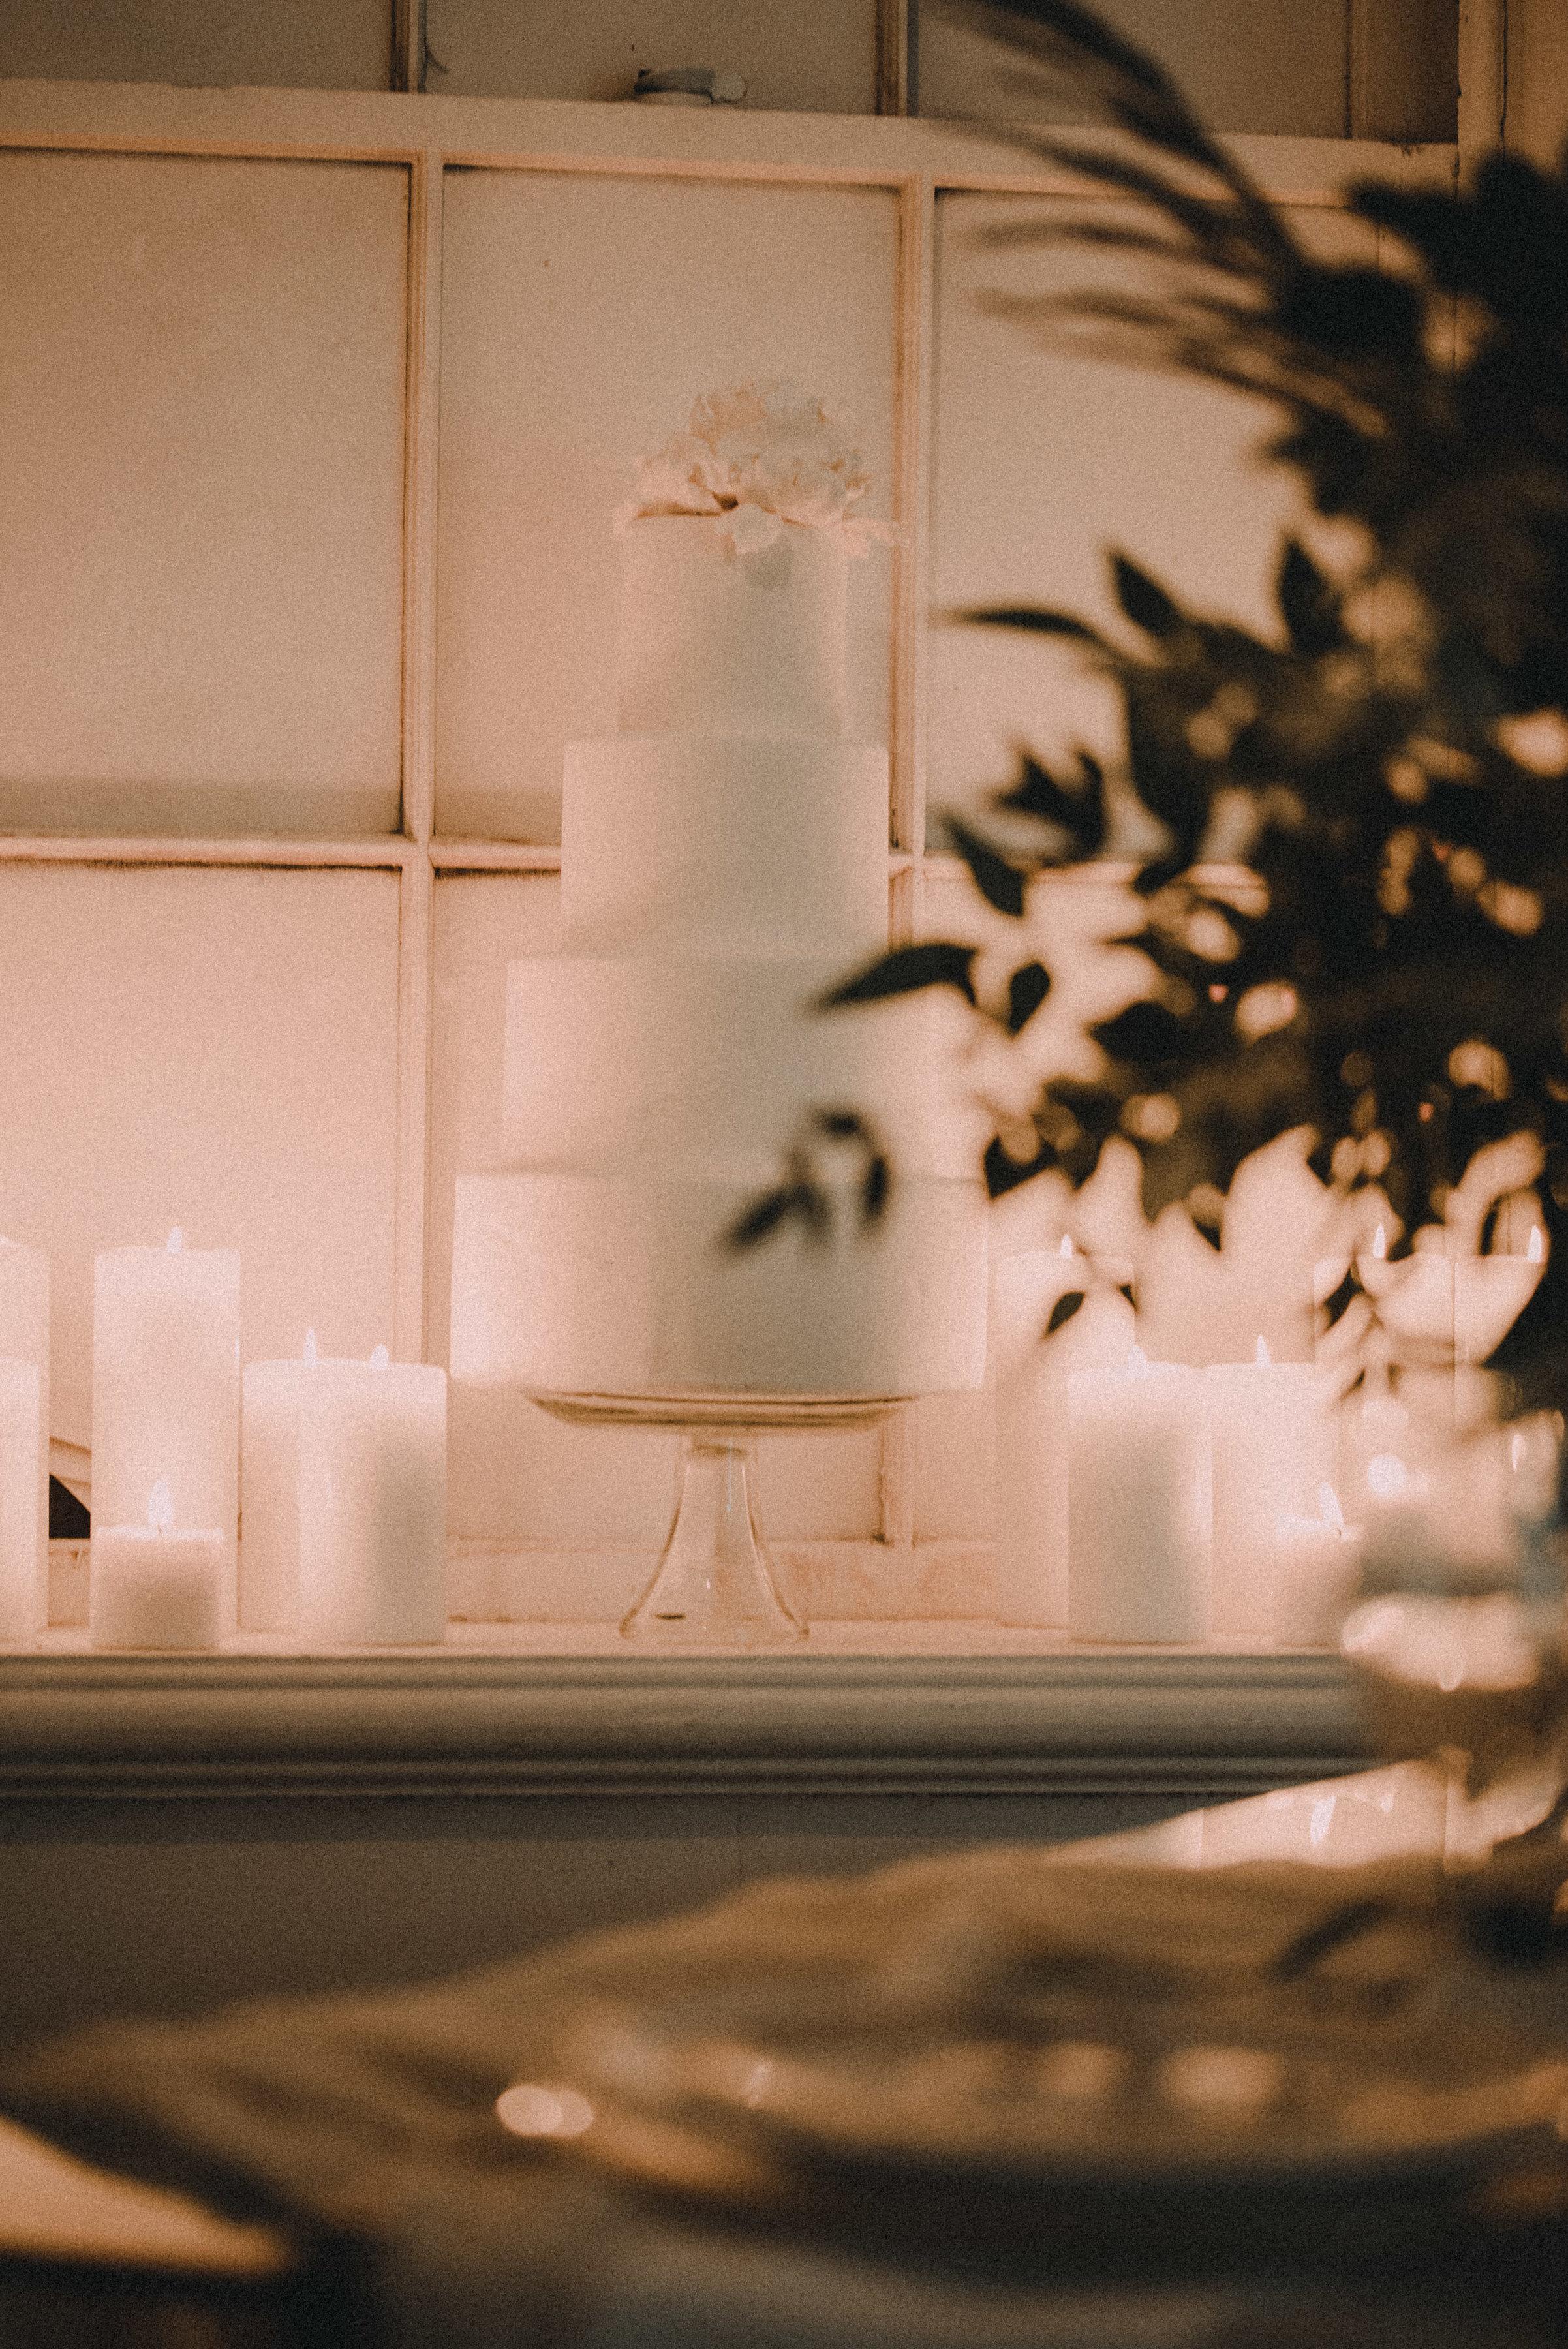 Wedding cake in window